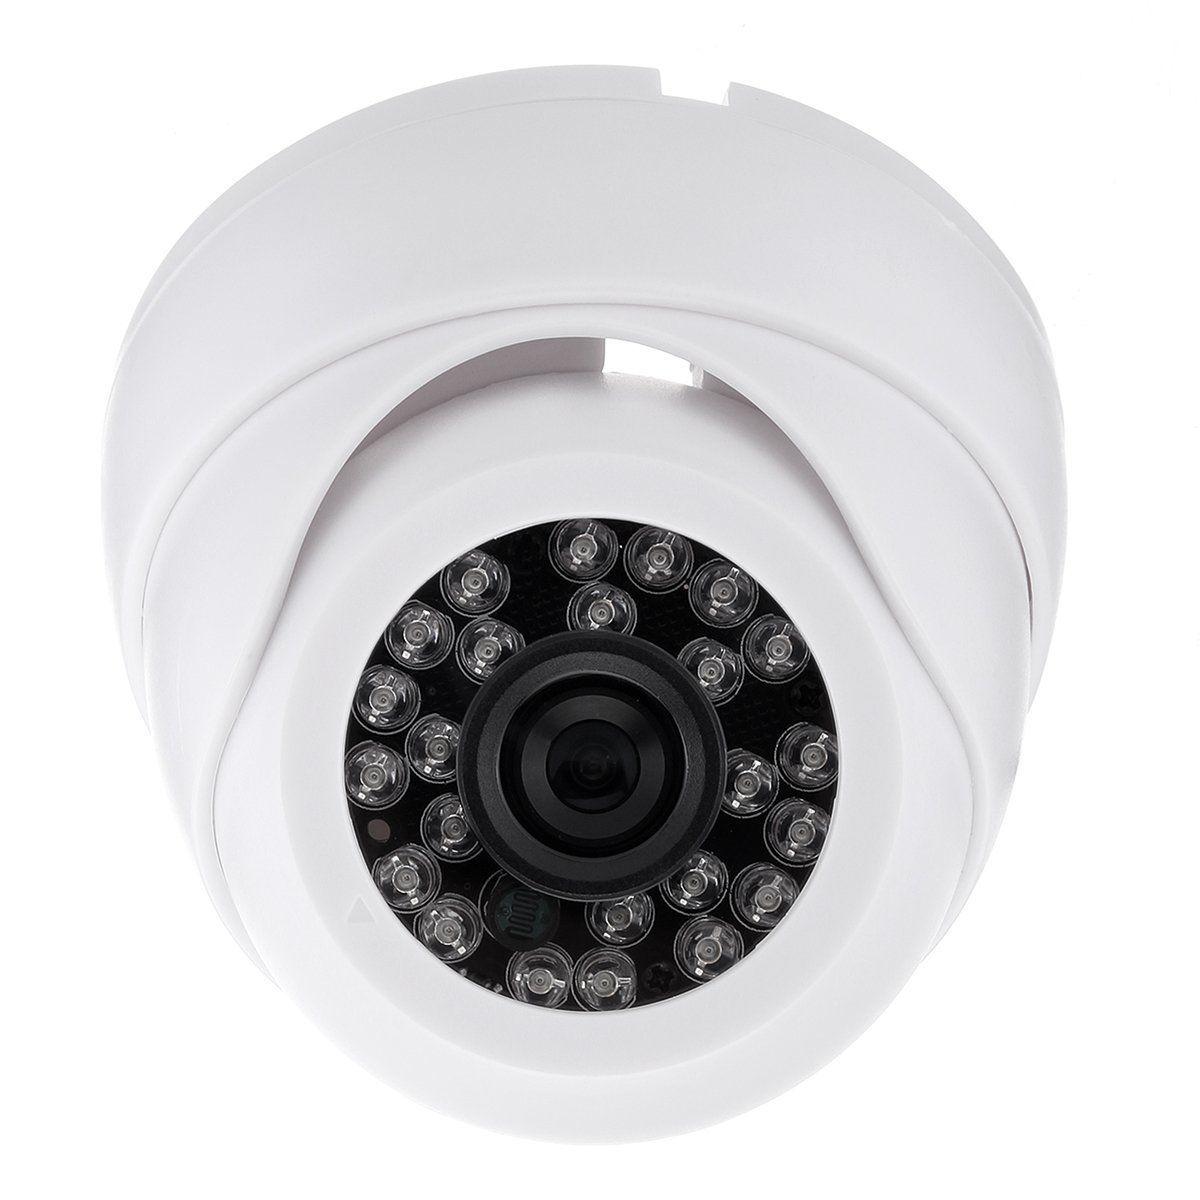 Hd 1200tvl Cctv Surveillance Security Camera Outdoor Ir Night Vision Security Cameras For Home Wireless Home Security Systems Cctv Surveillance